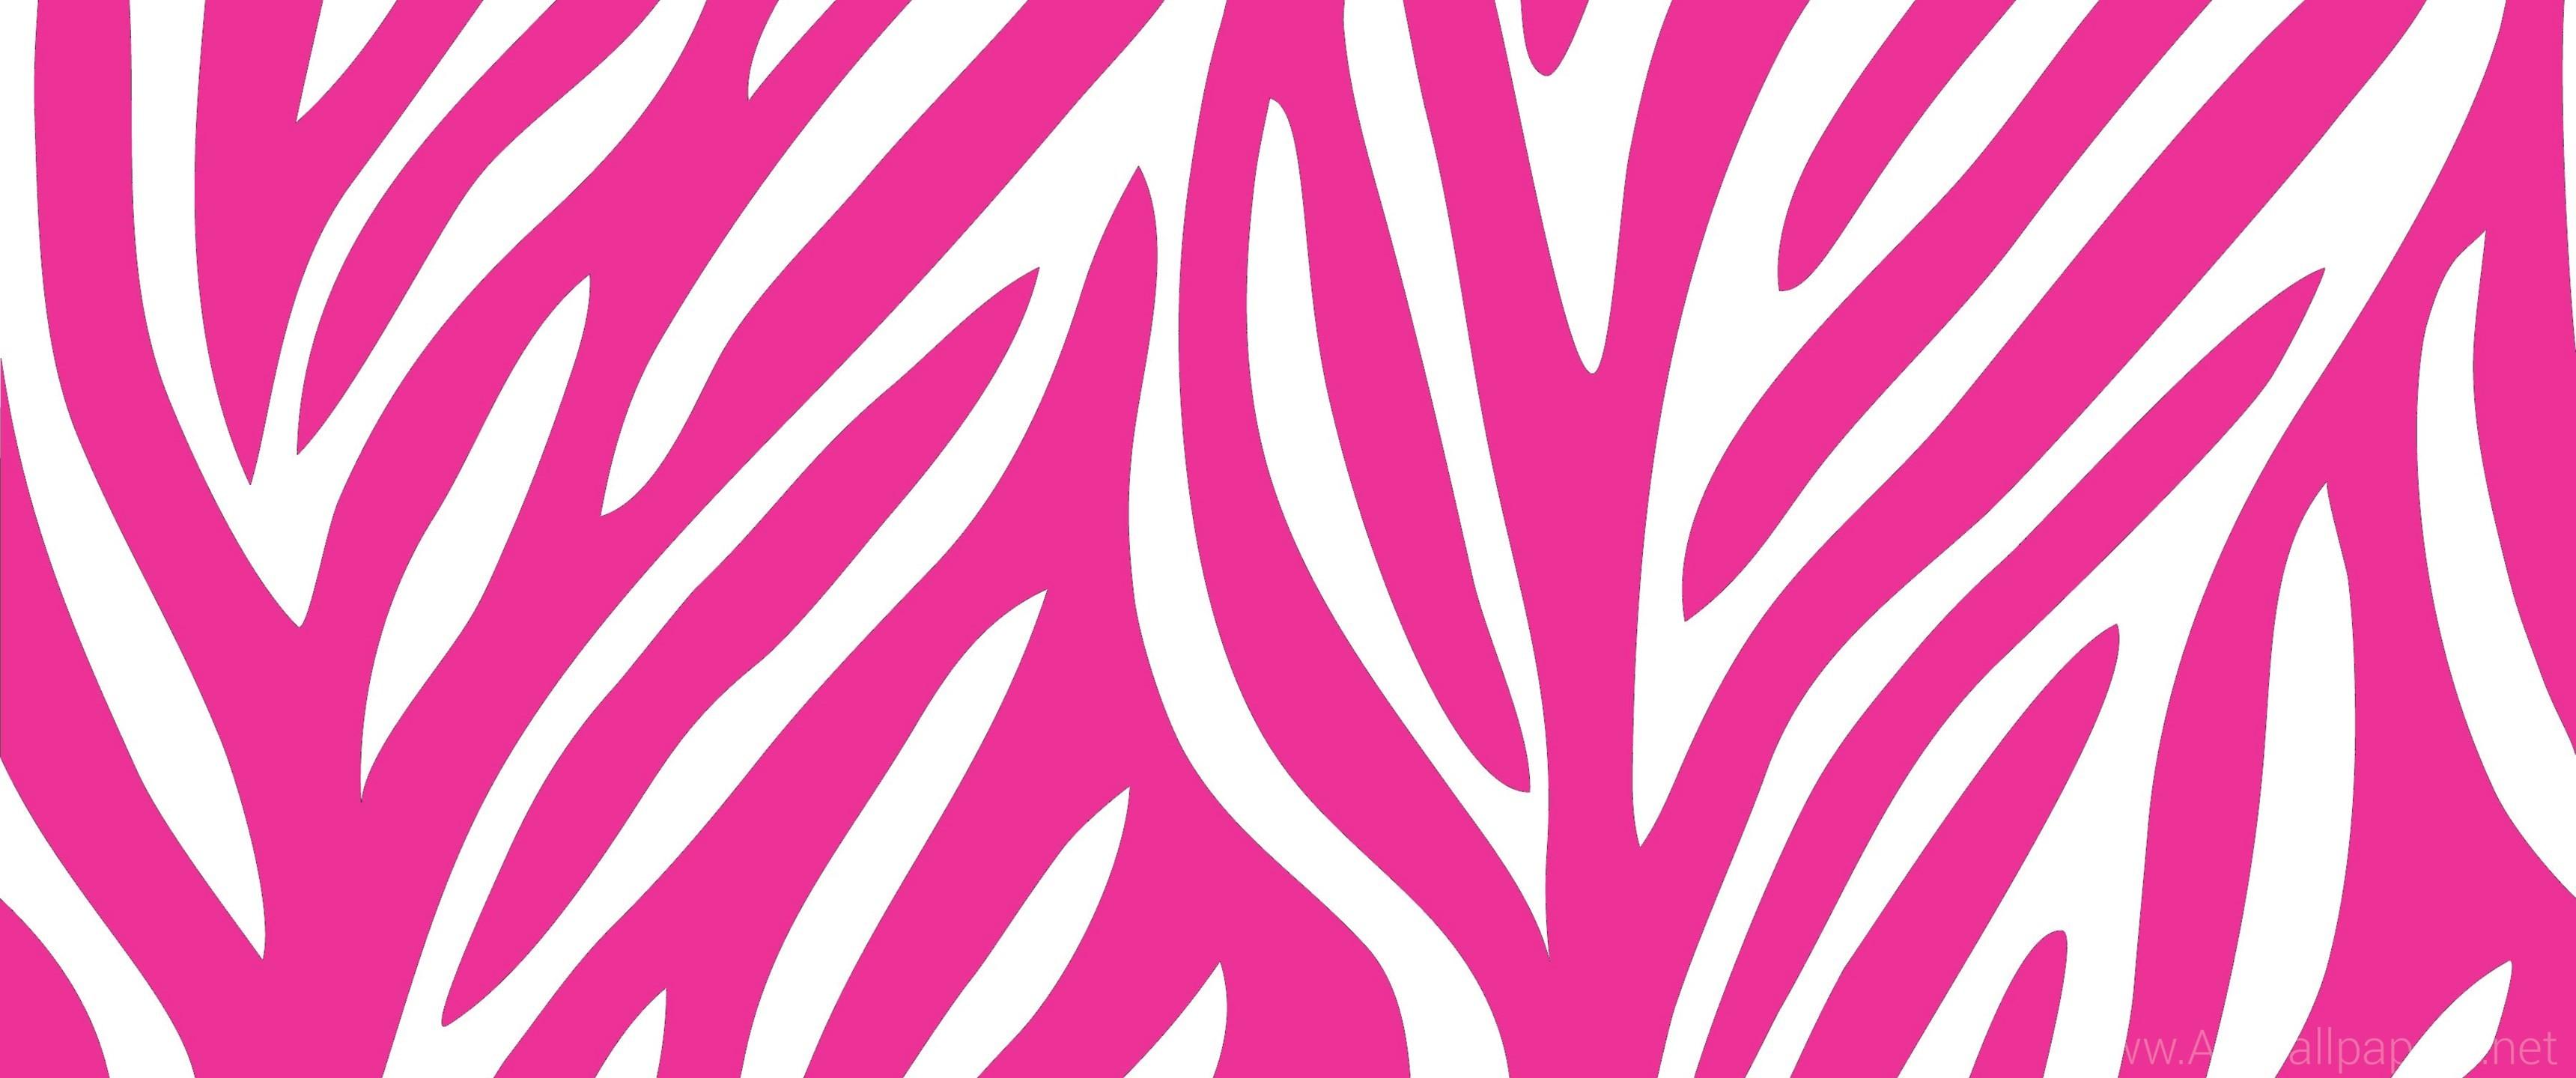 Cute Giraffe Wallpaper – WallpaperSafari